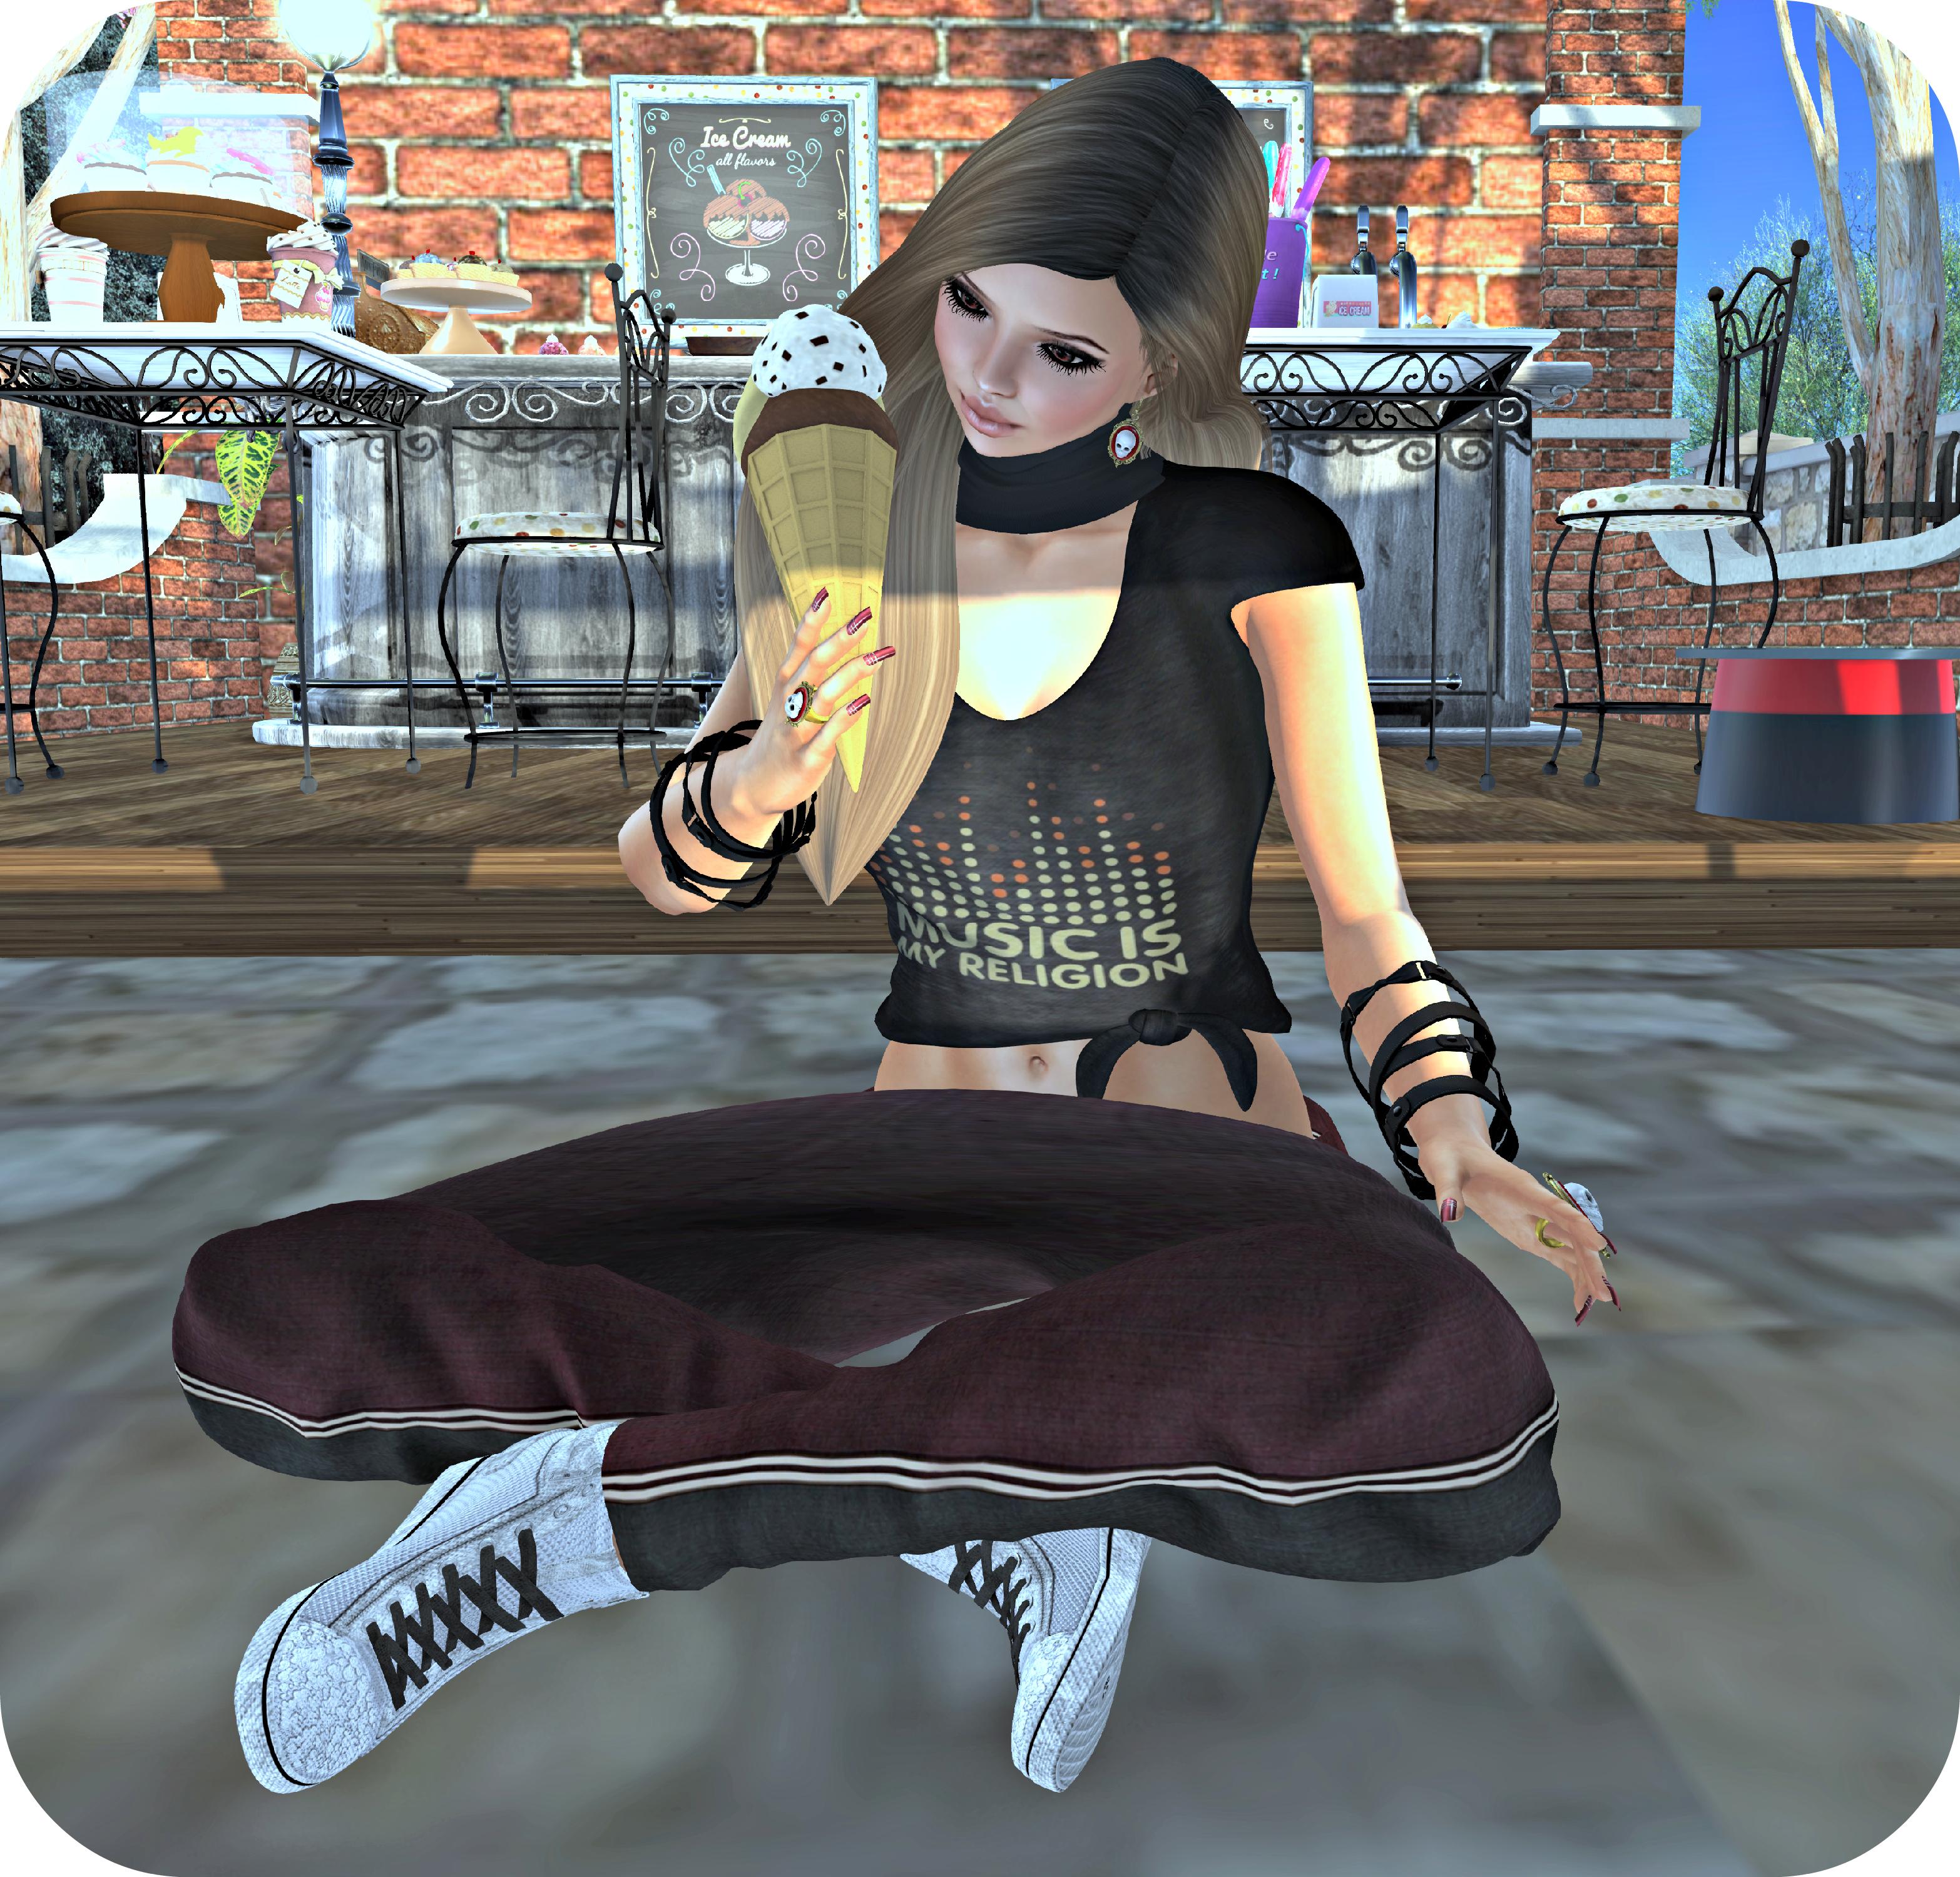 Tameless, 7Deadly, AG, DS, MG, Bracelets, Kicks, Mmmm #3_cropped